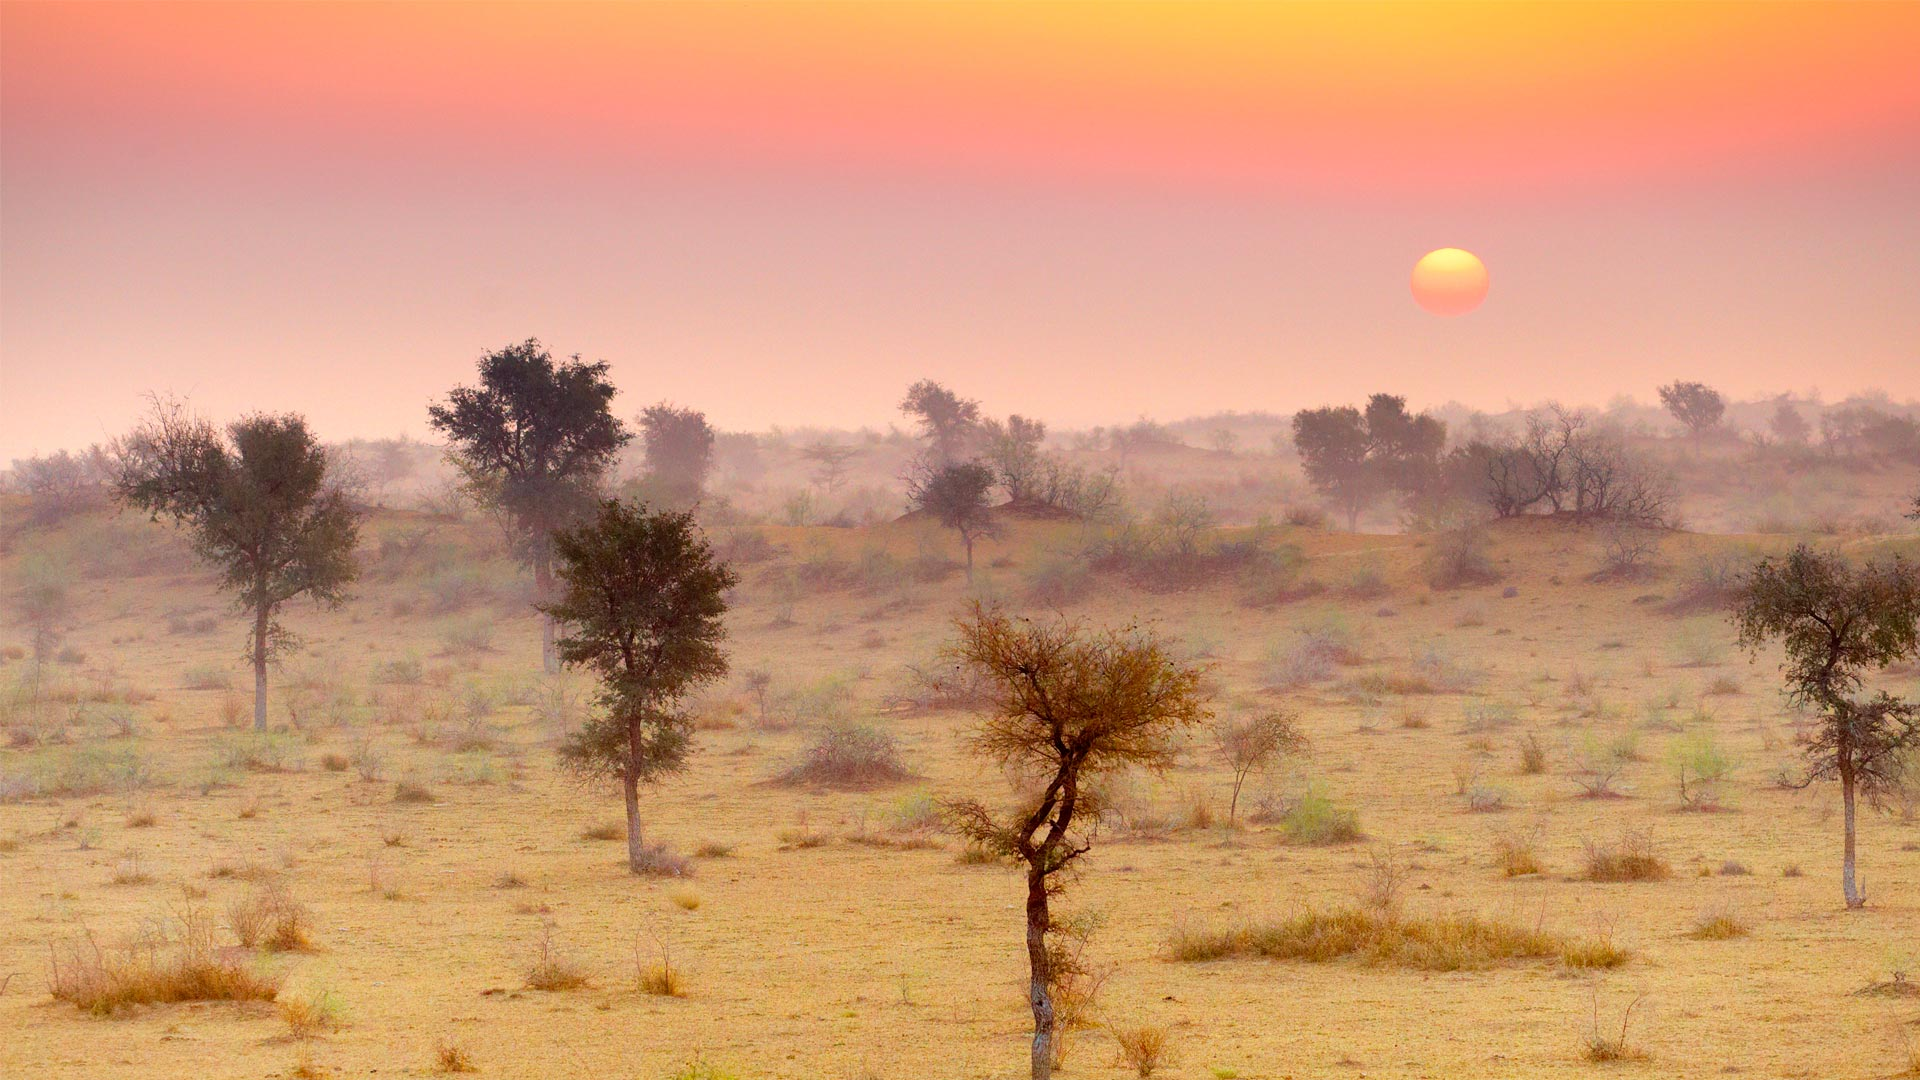 Thar Desert near Jaisalmer, Rajasthan, India (© Jan Wlodarczyk/Alamy Stock Photo)